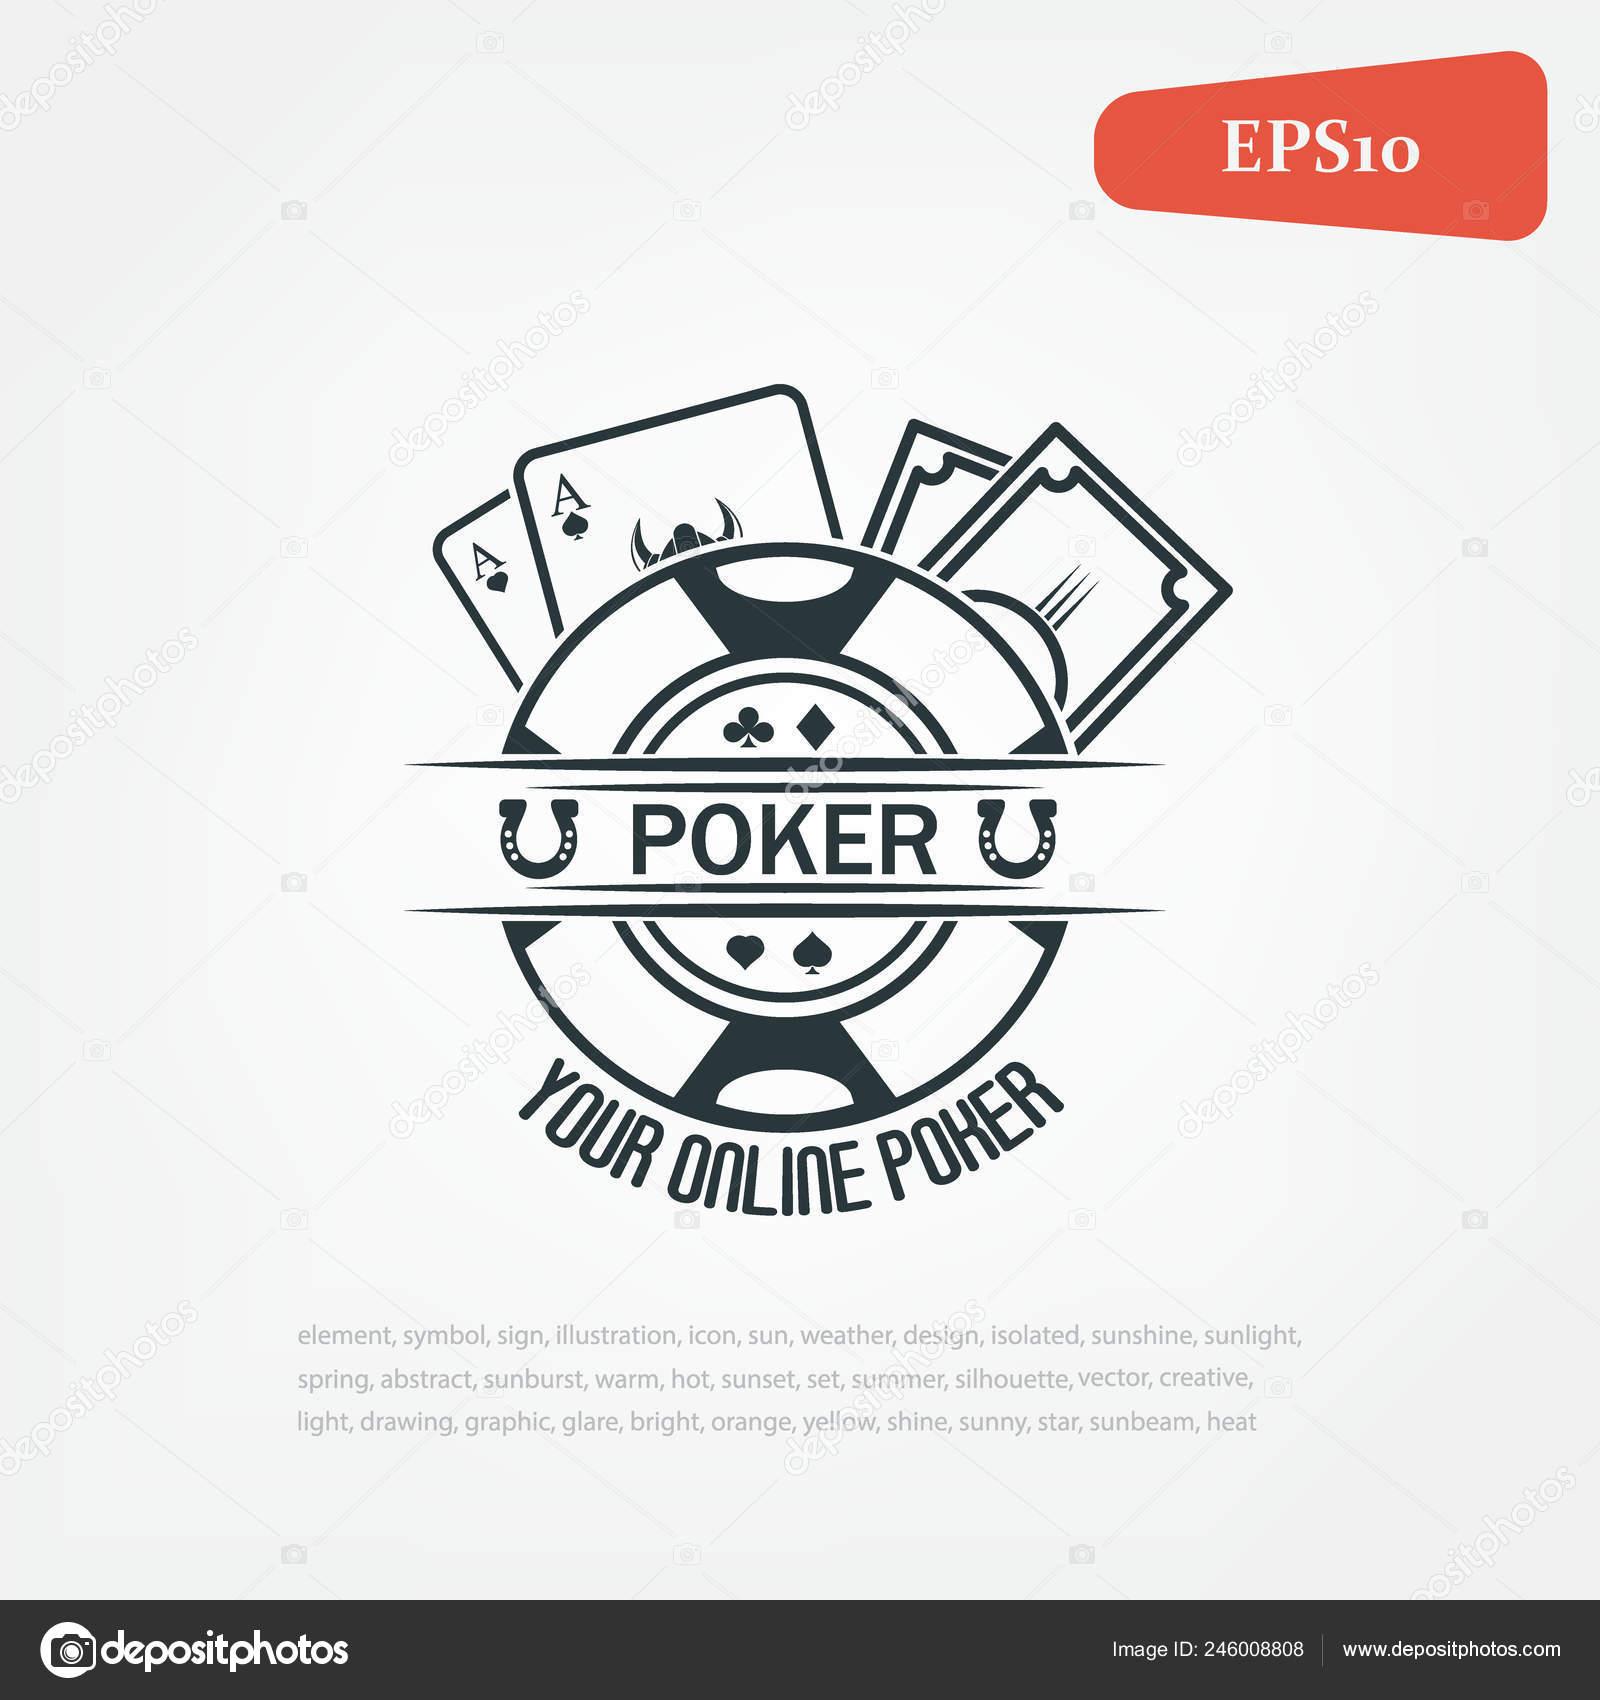 Poker Emblems Poker Online Poker Logo Stock Photo Image By C Rs89 246008808